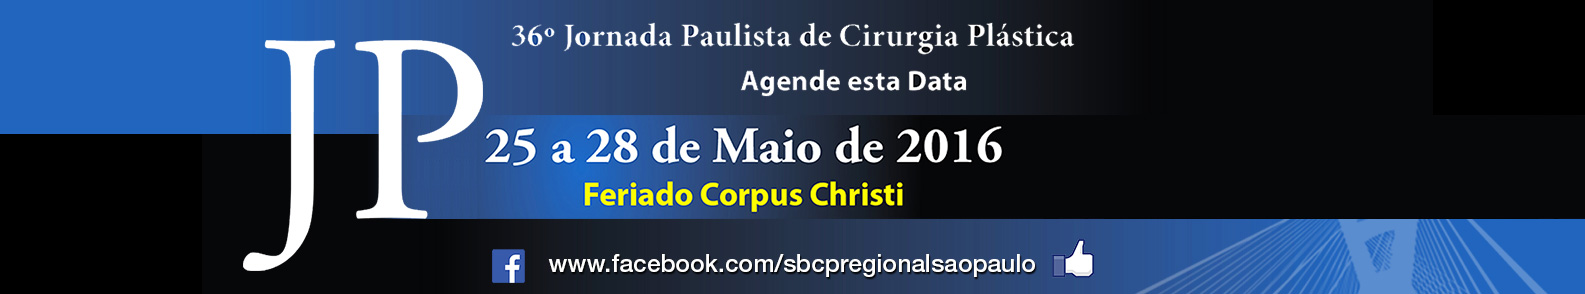 36ª Jornada Paulista de Cirurgia Plástica